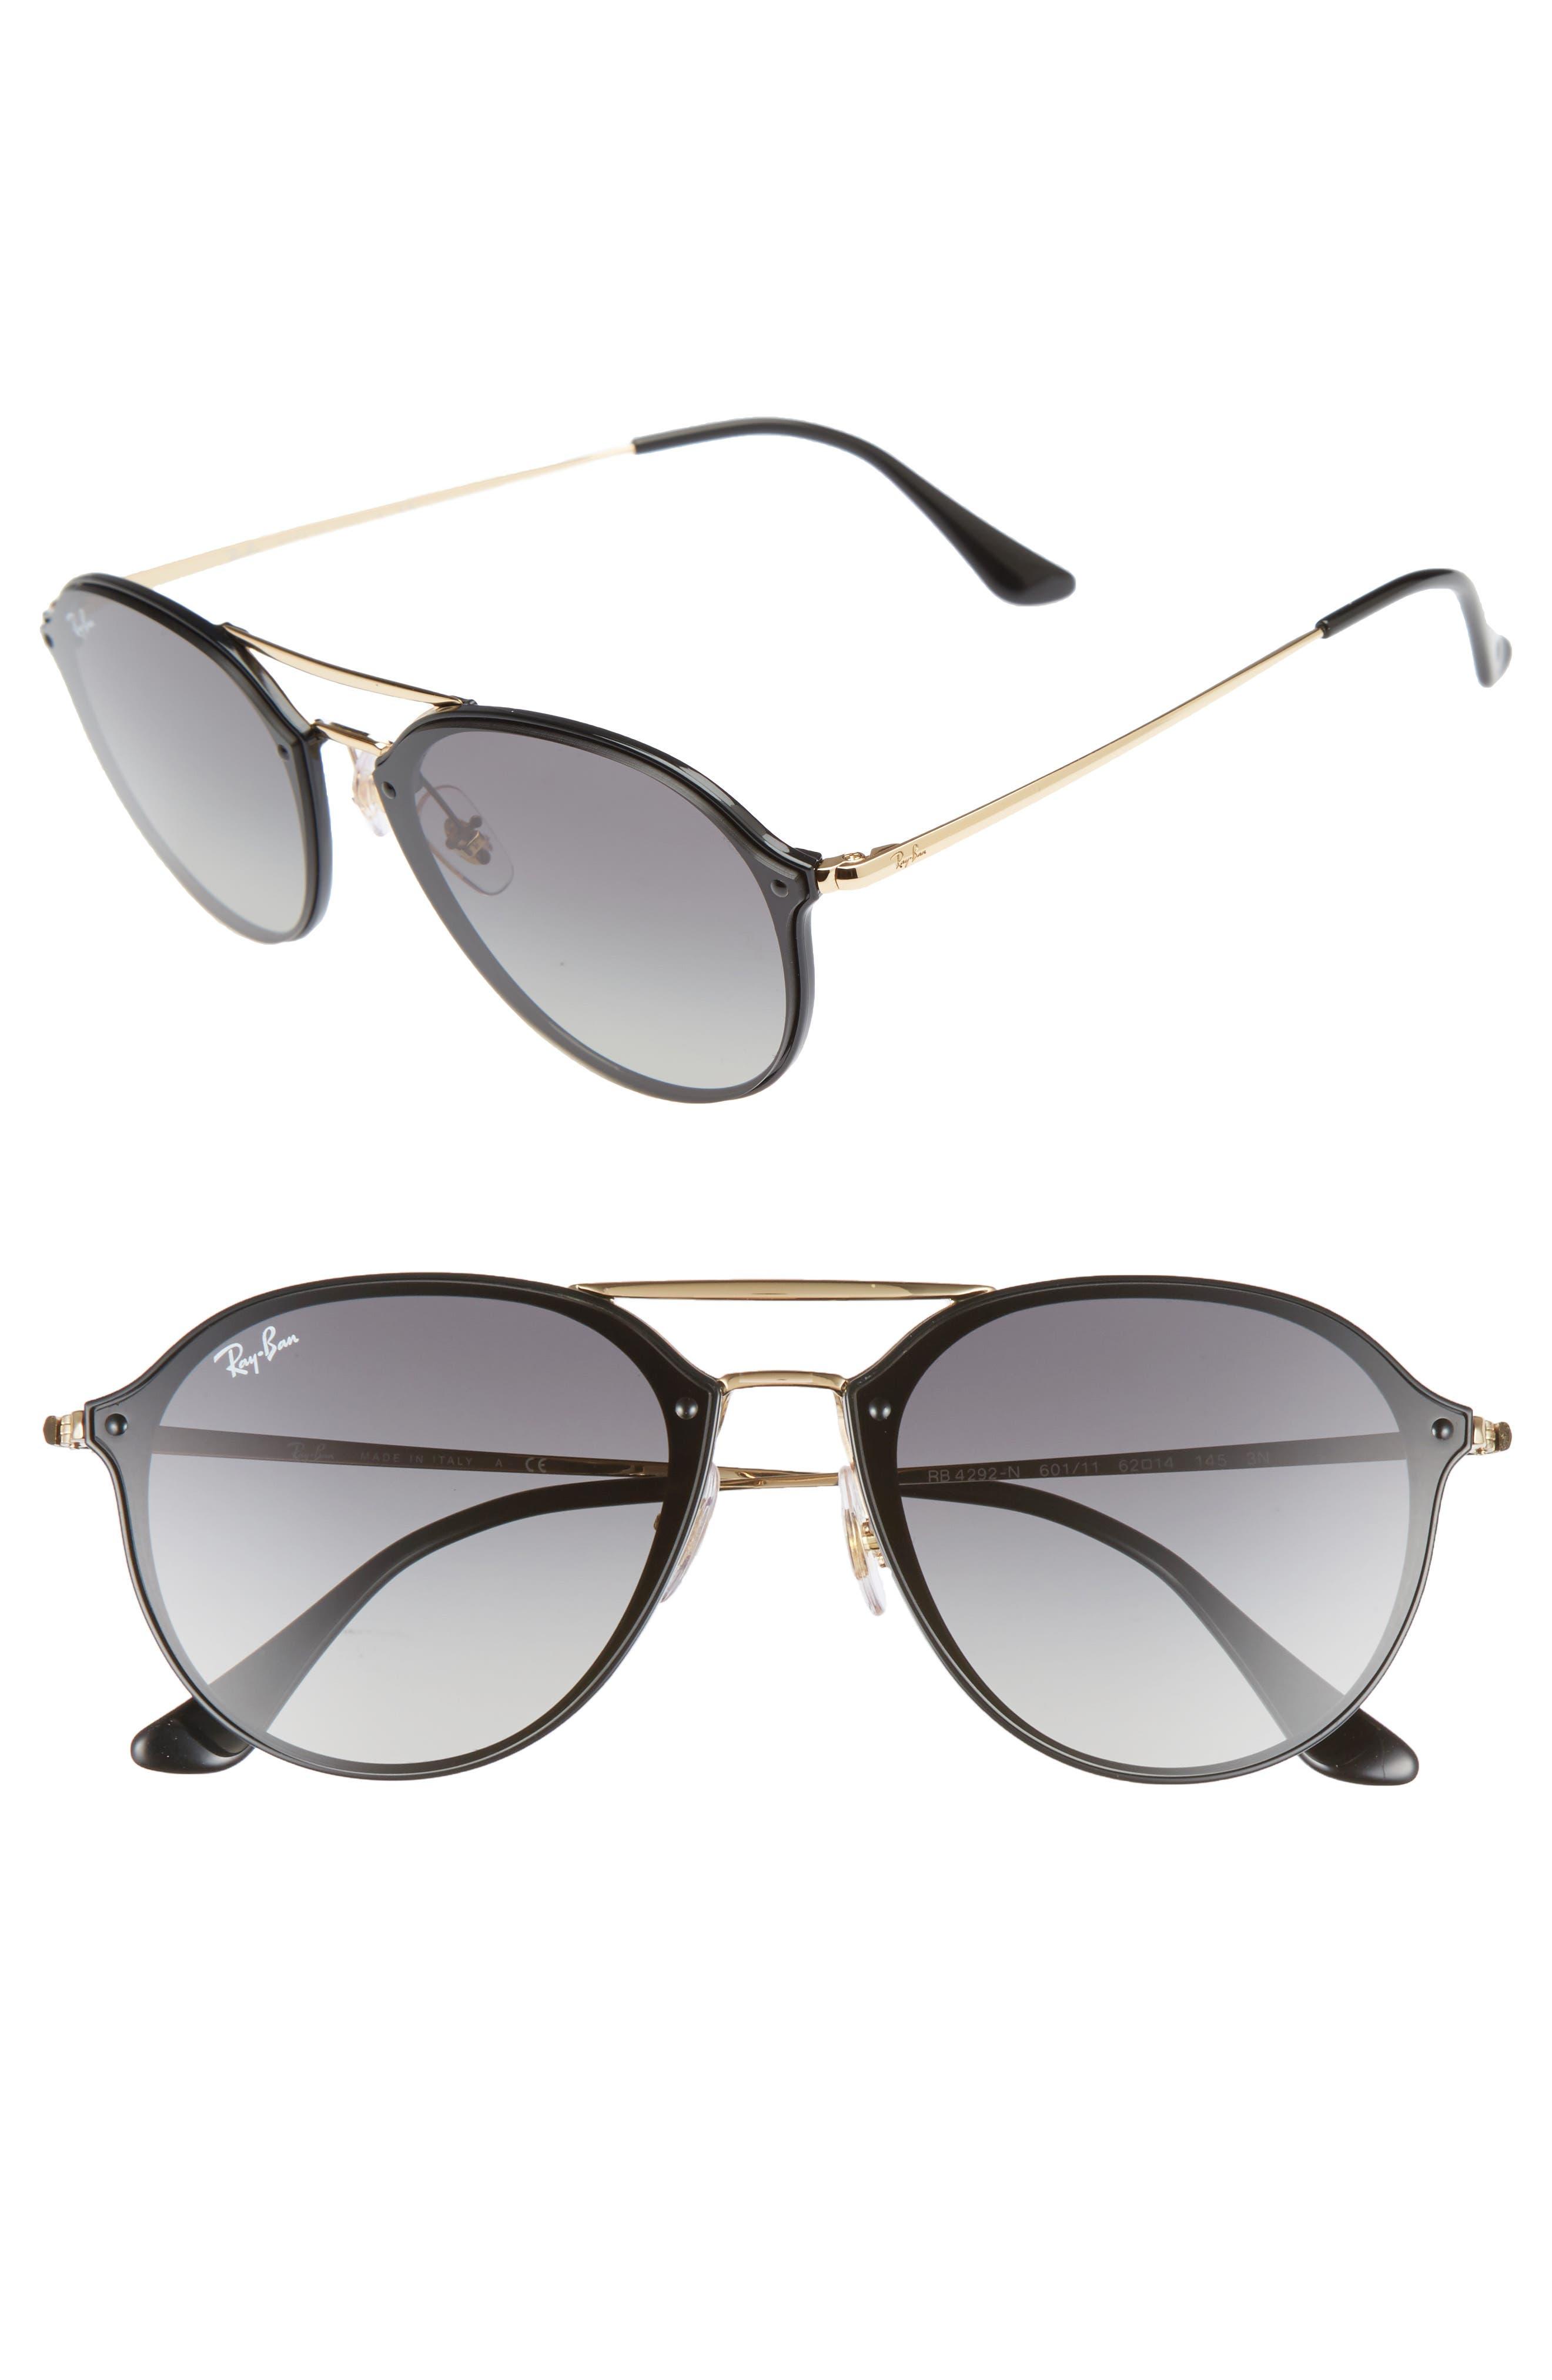 0e91a38702 aliexpress ray ban 62mm gradient lens aviator sunglasses e8454 026e4